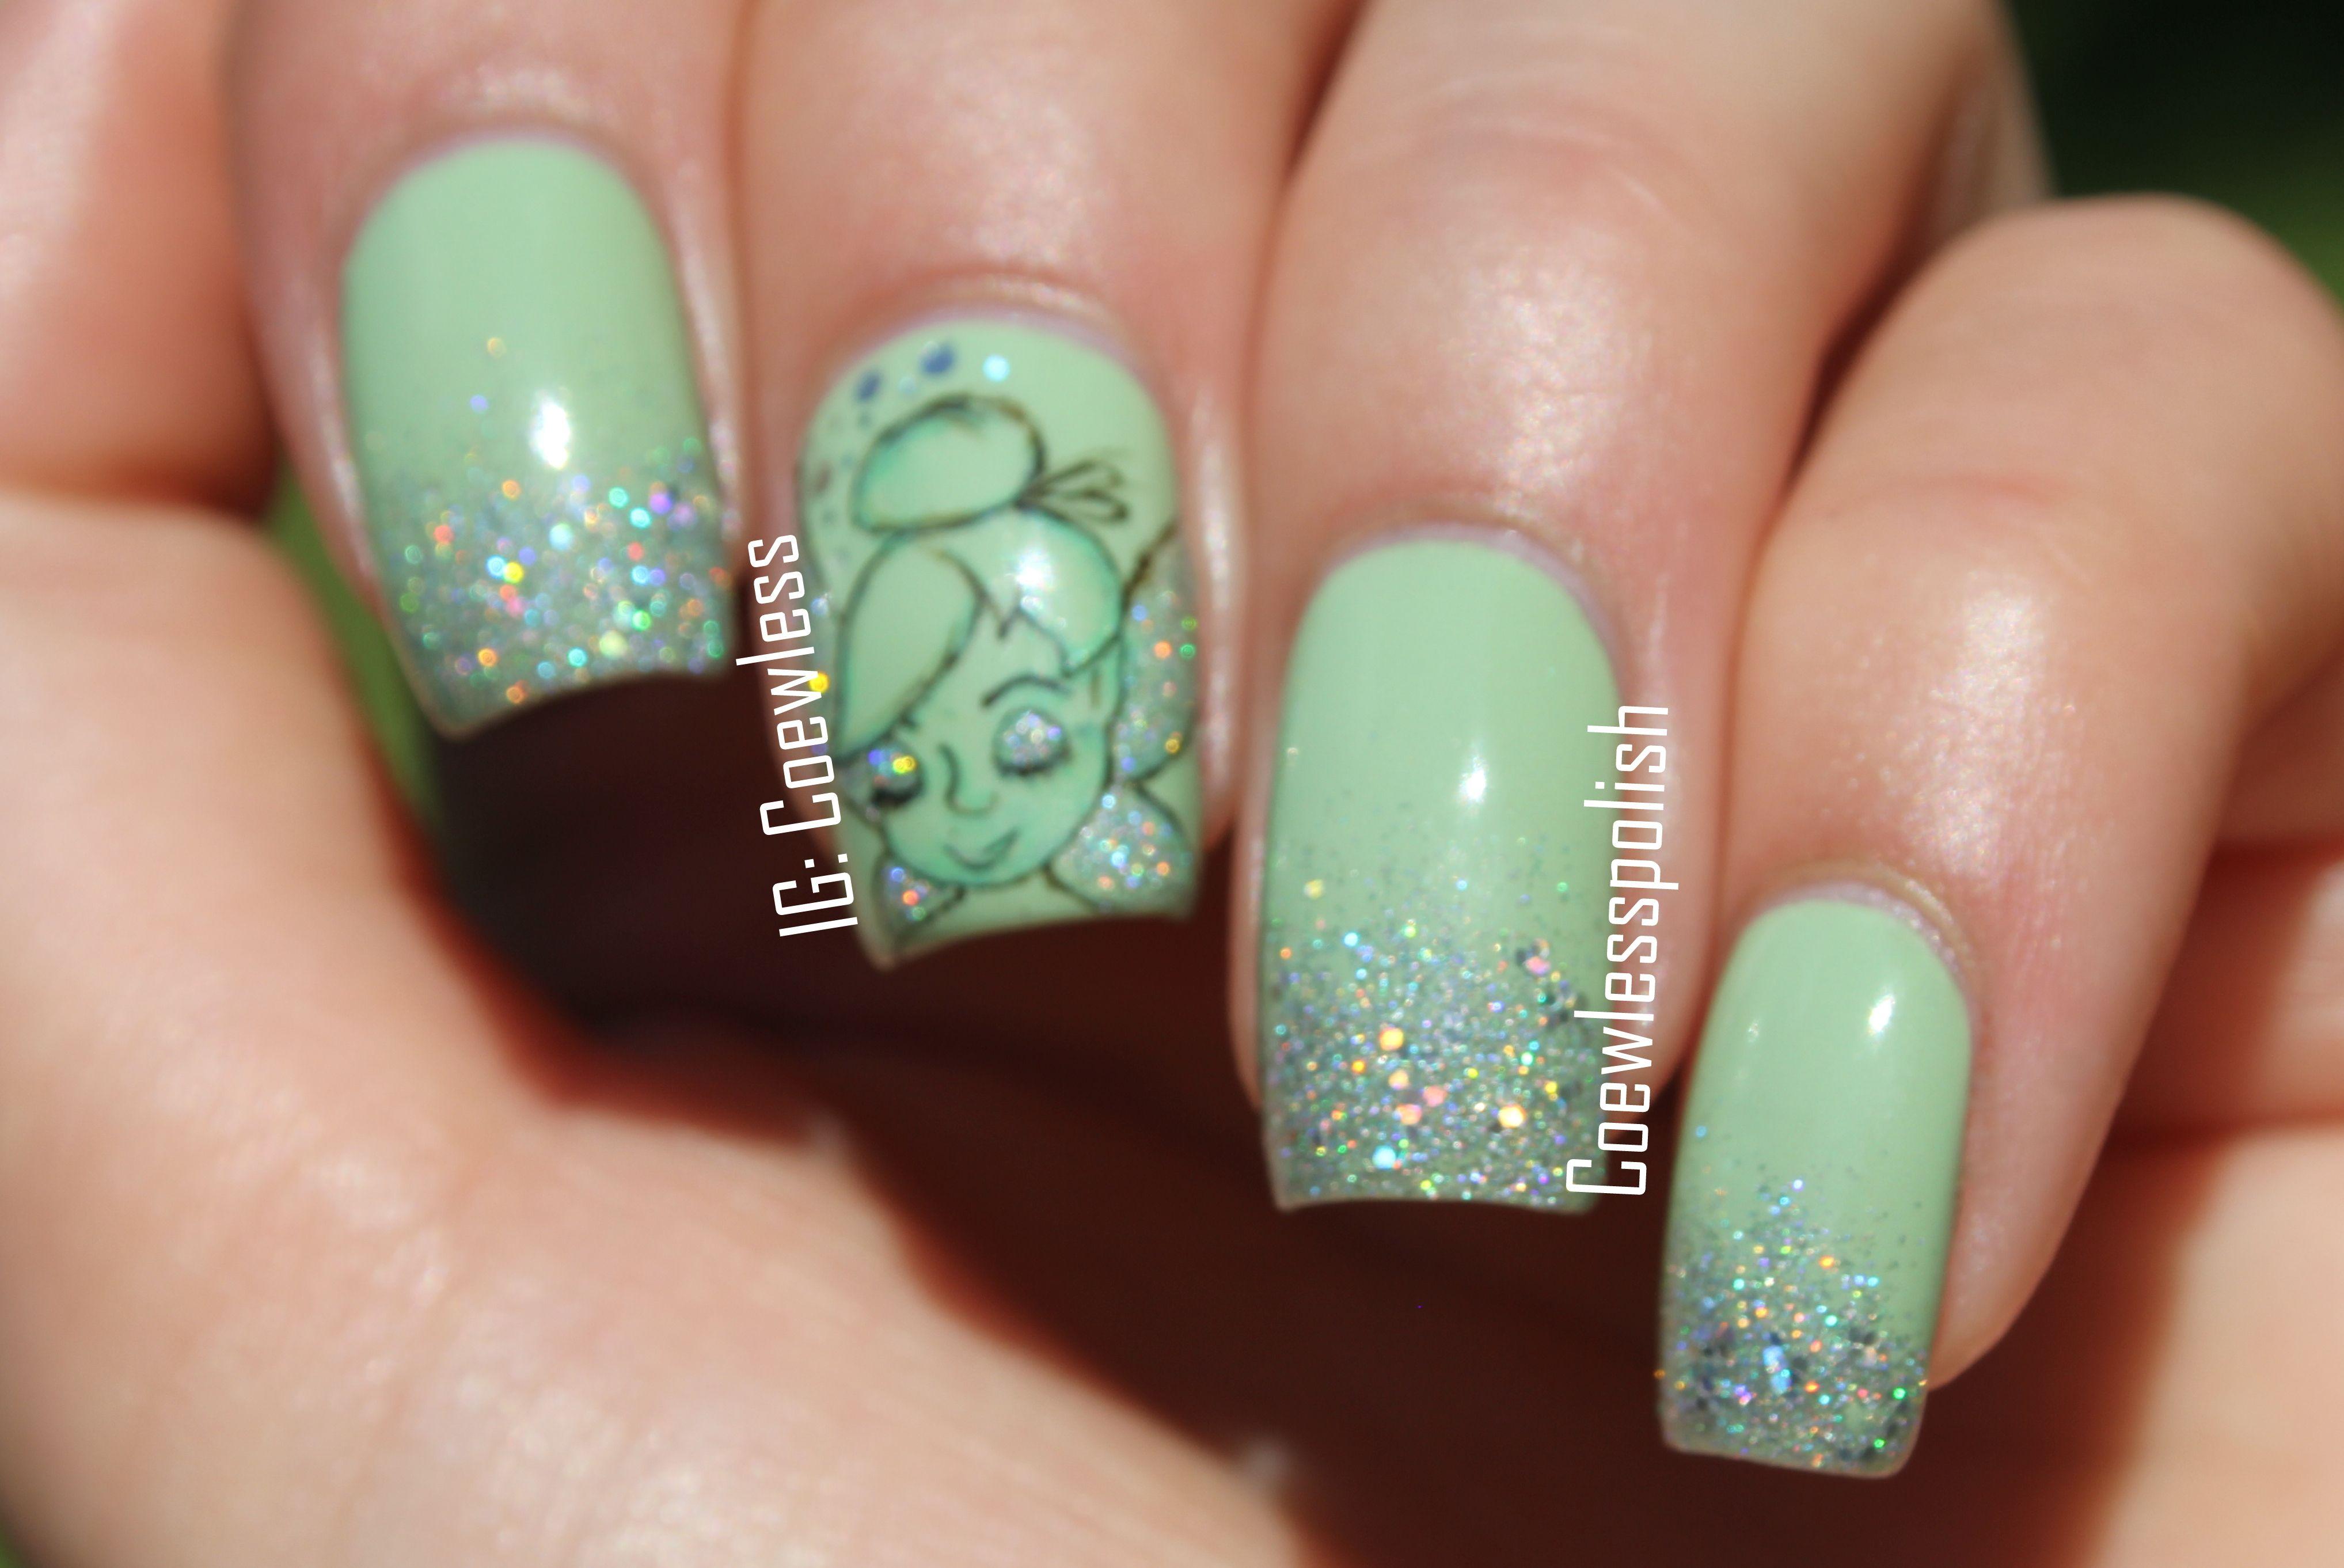 Tinkerbell Nails Tinkerbell Nails | Nail designs | Pinterest